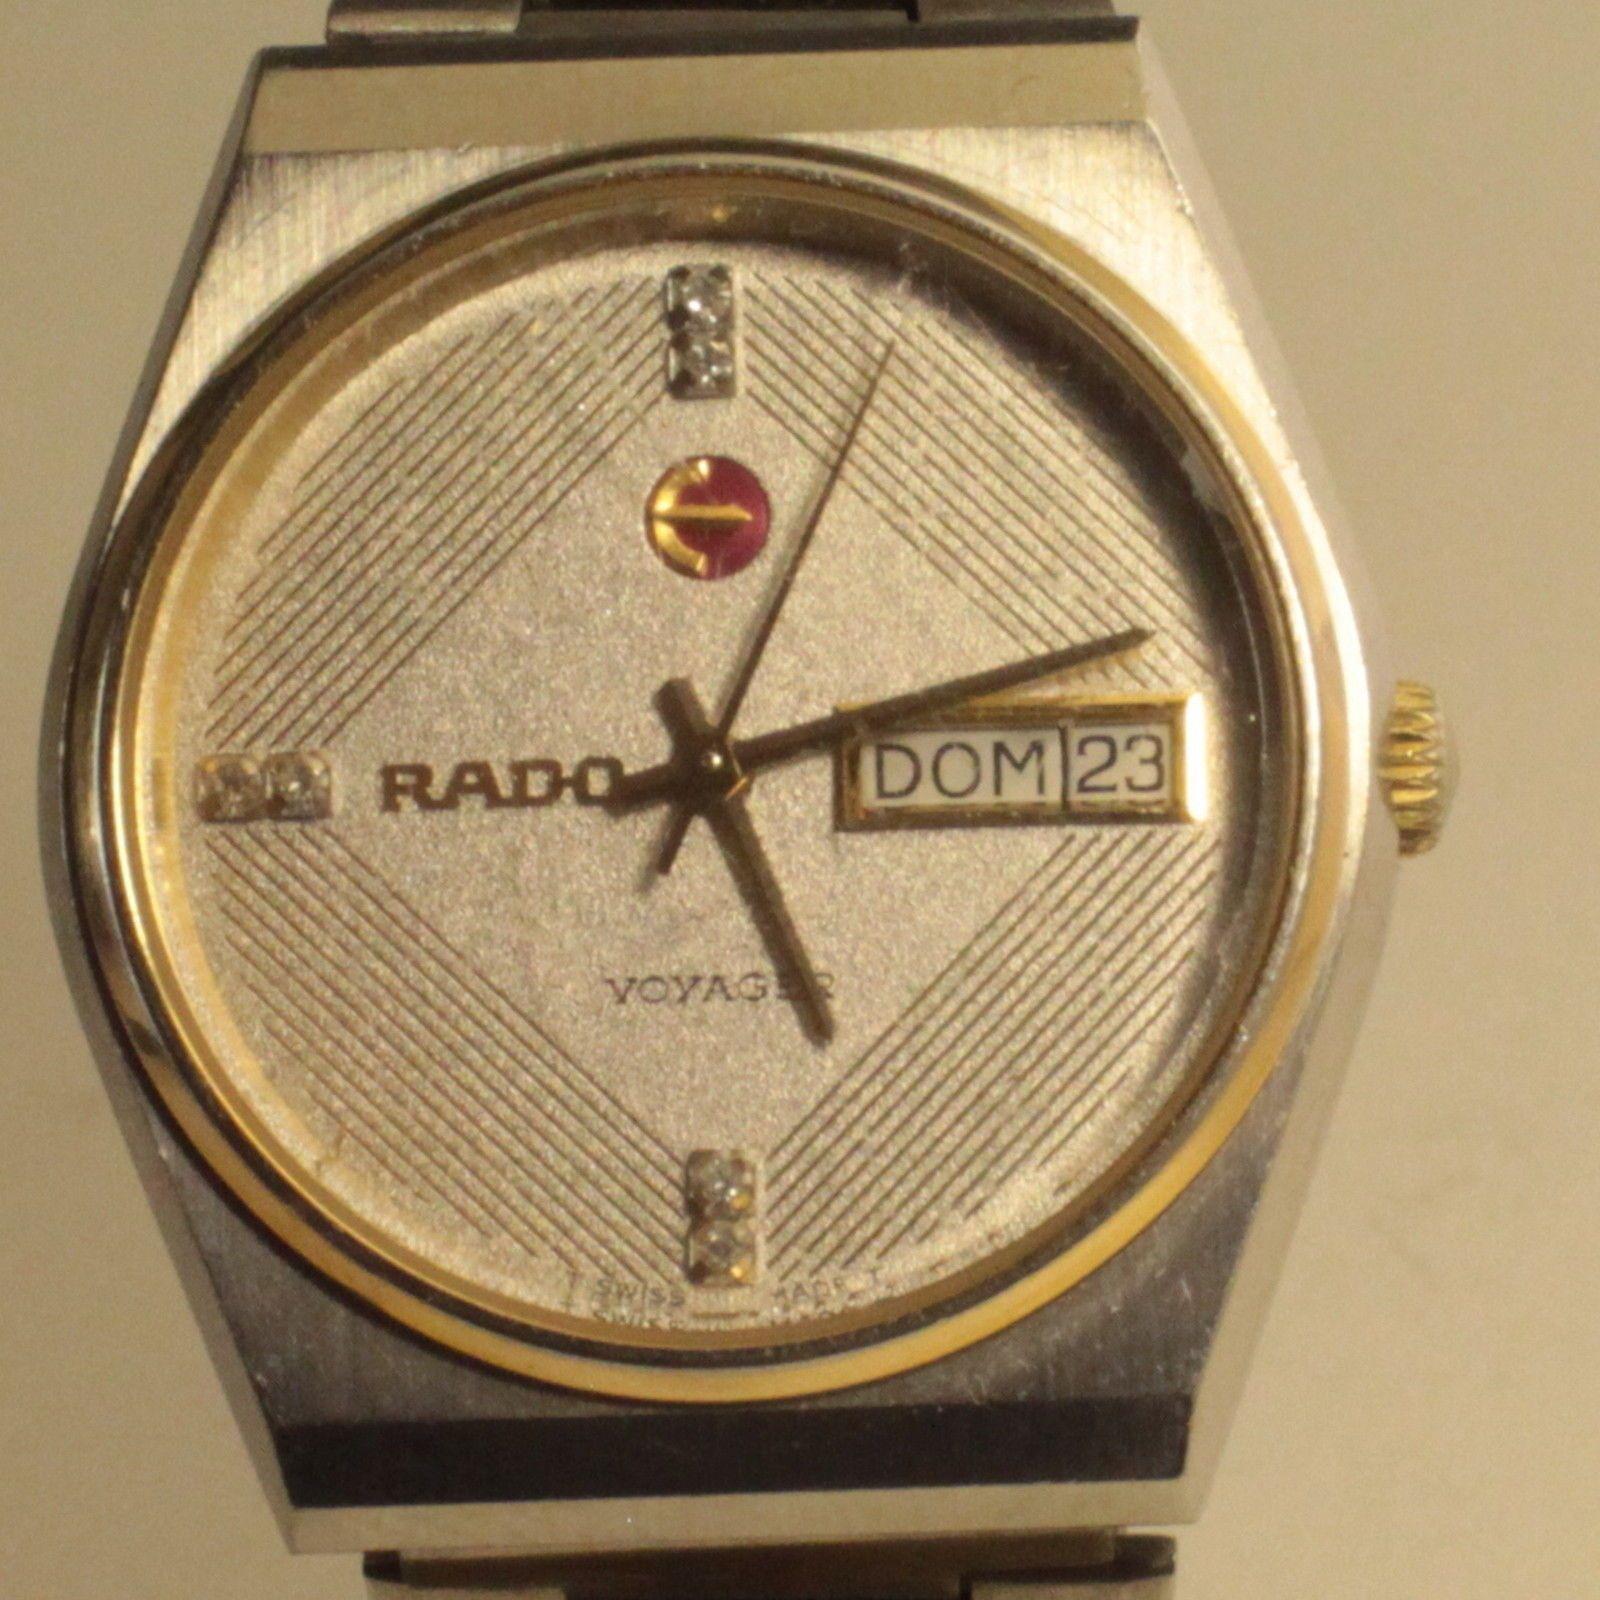 Rare Rado Voyager Men's Watch, Automatic ETA 2836-1 , Swiss Made,Read condition